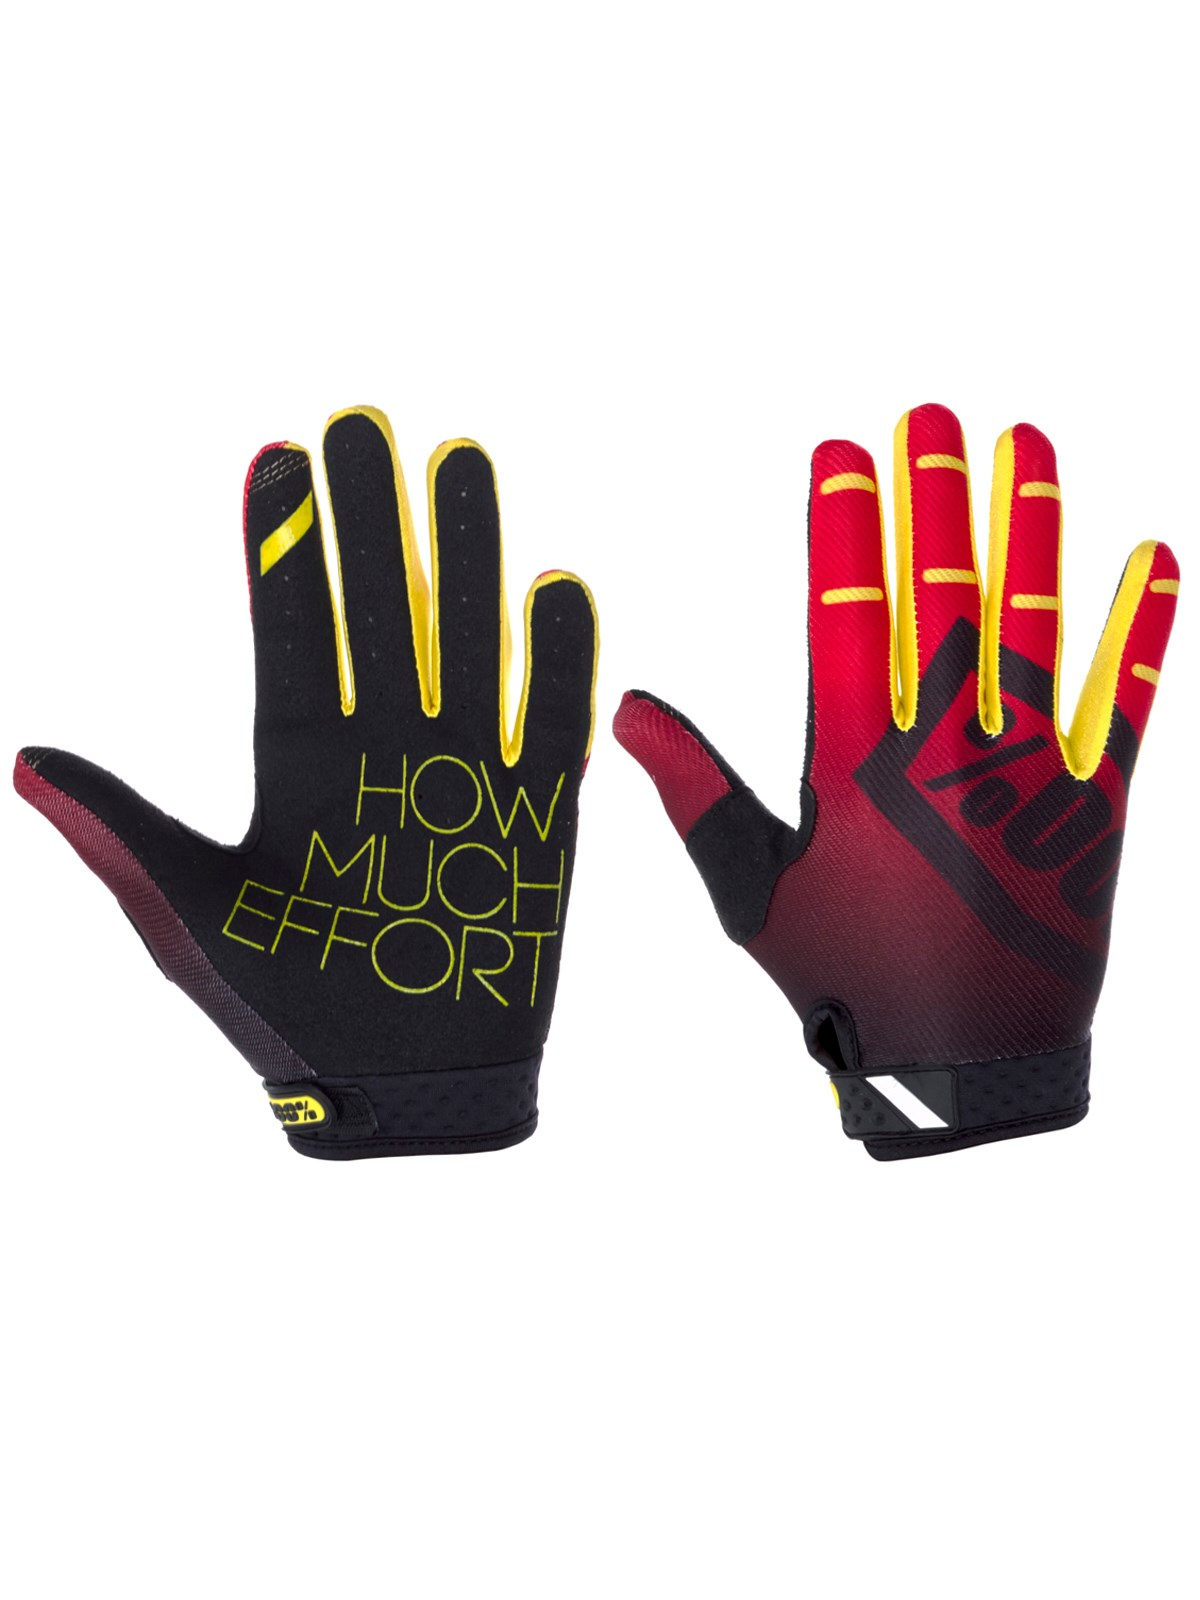 Motokrosové rukavice 100% RIDEFIT CORPO RED VEL. L  8d3b6b7f7a